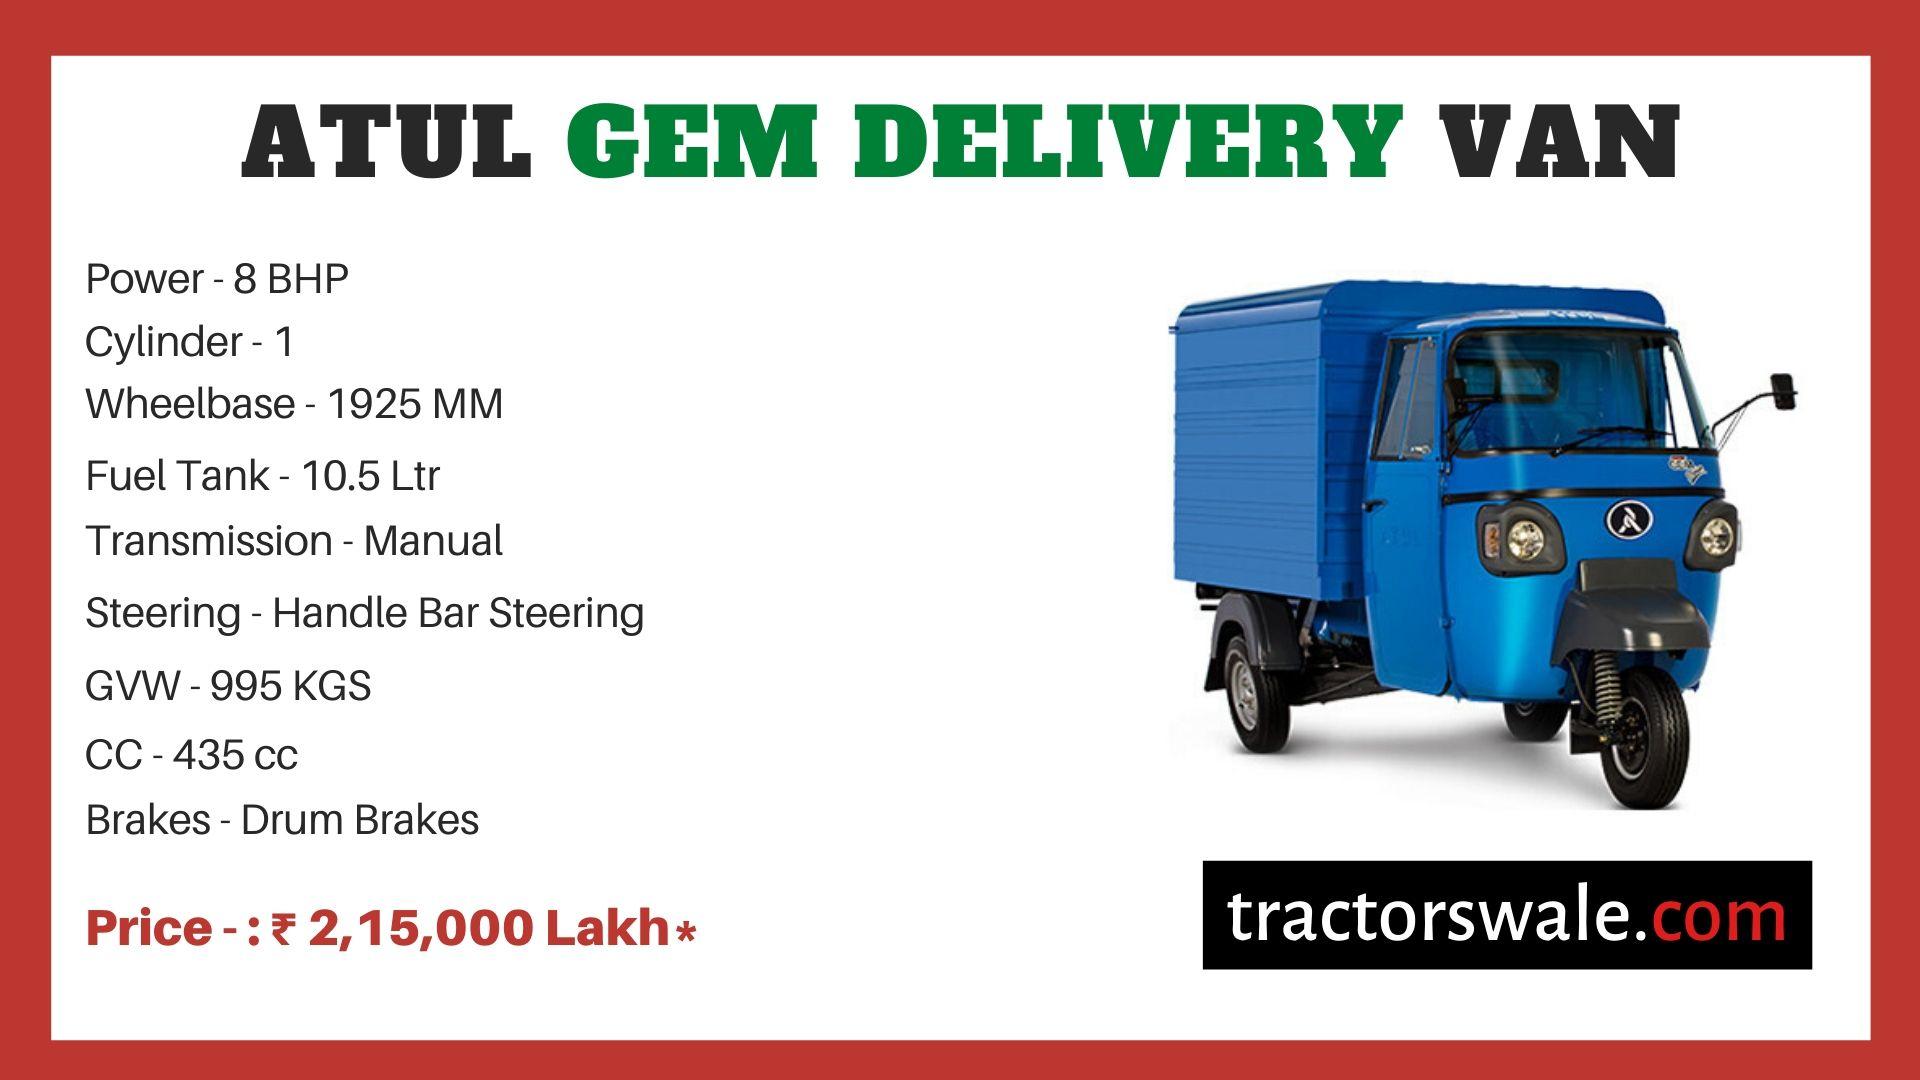 Atul GEM Delivery Van price